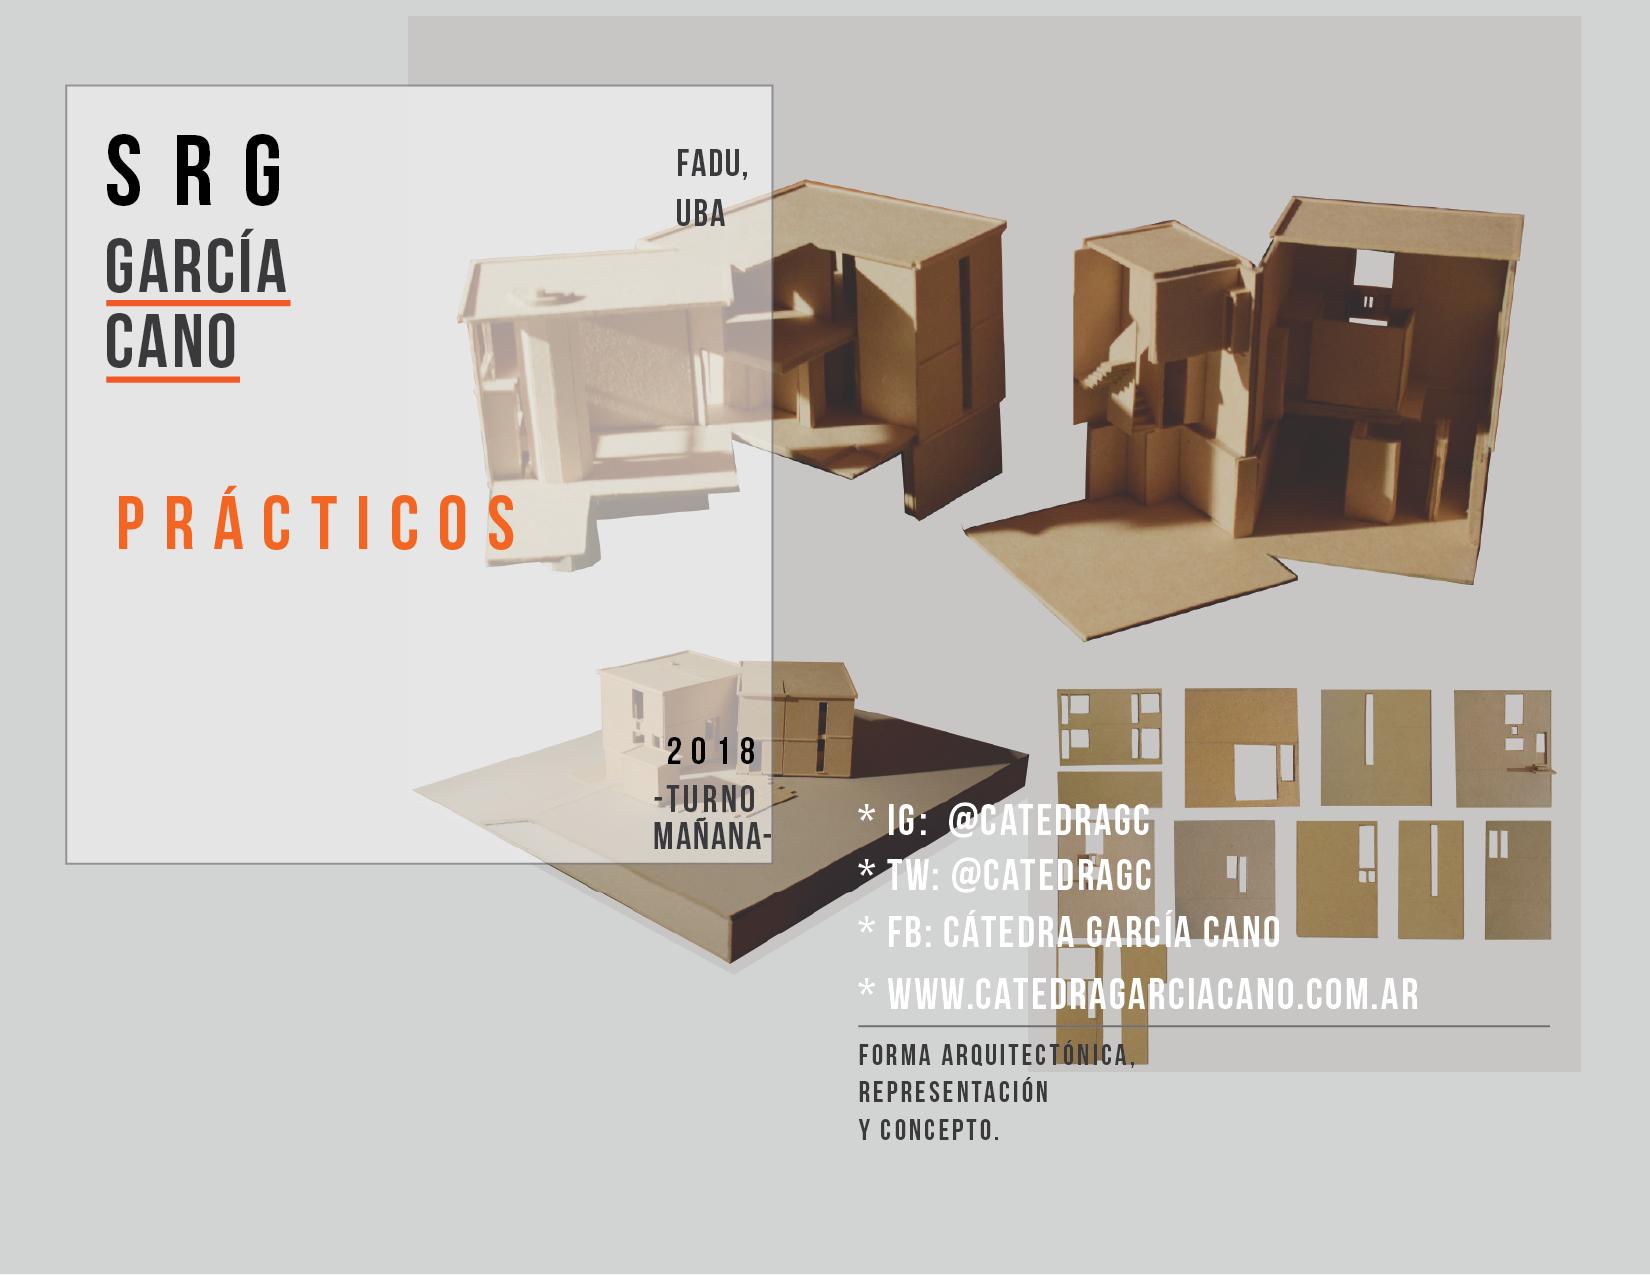 afiche-srg-18_practicos-02-03